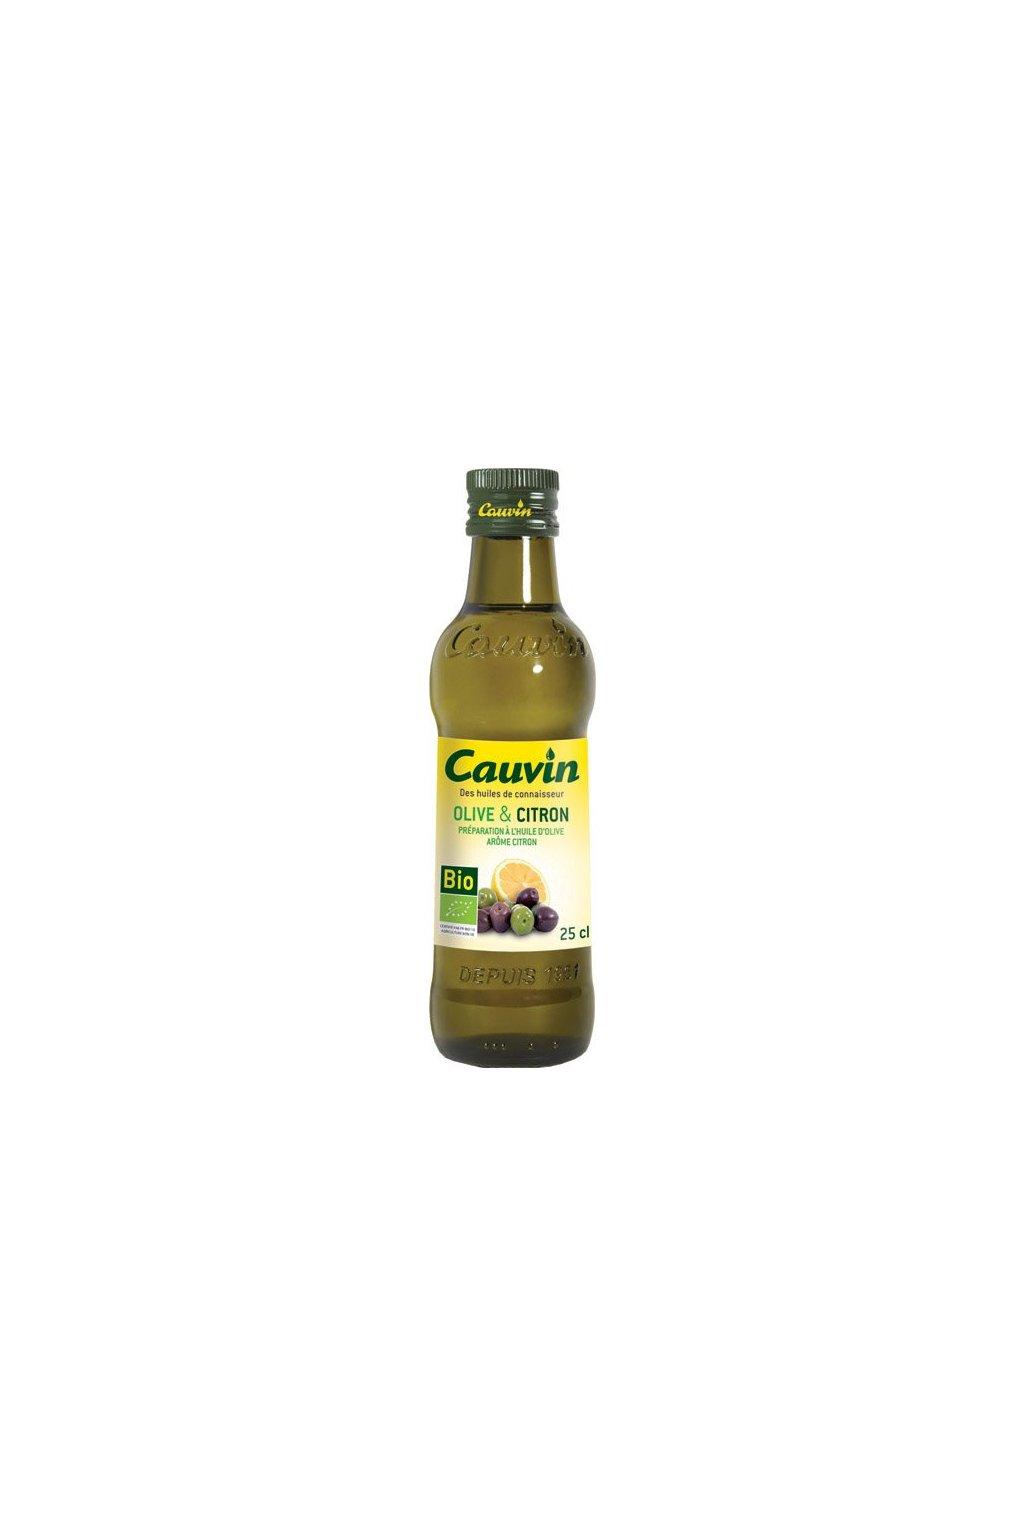 cauvin olivovy s citronom